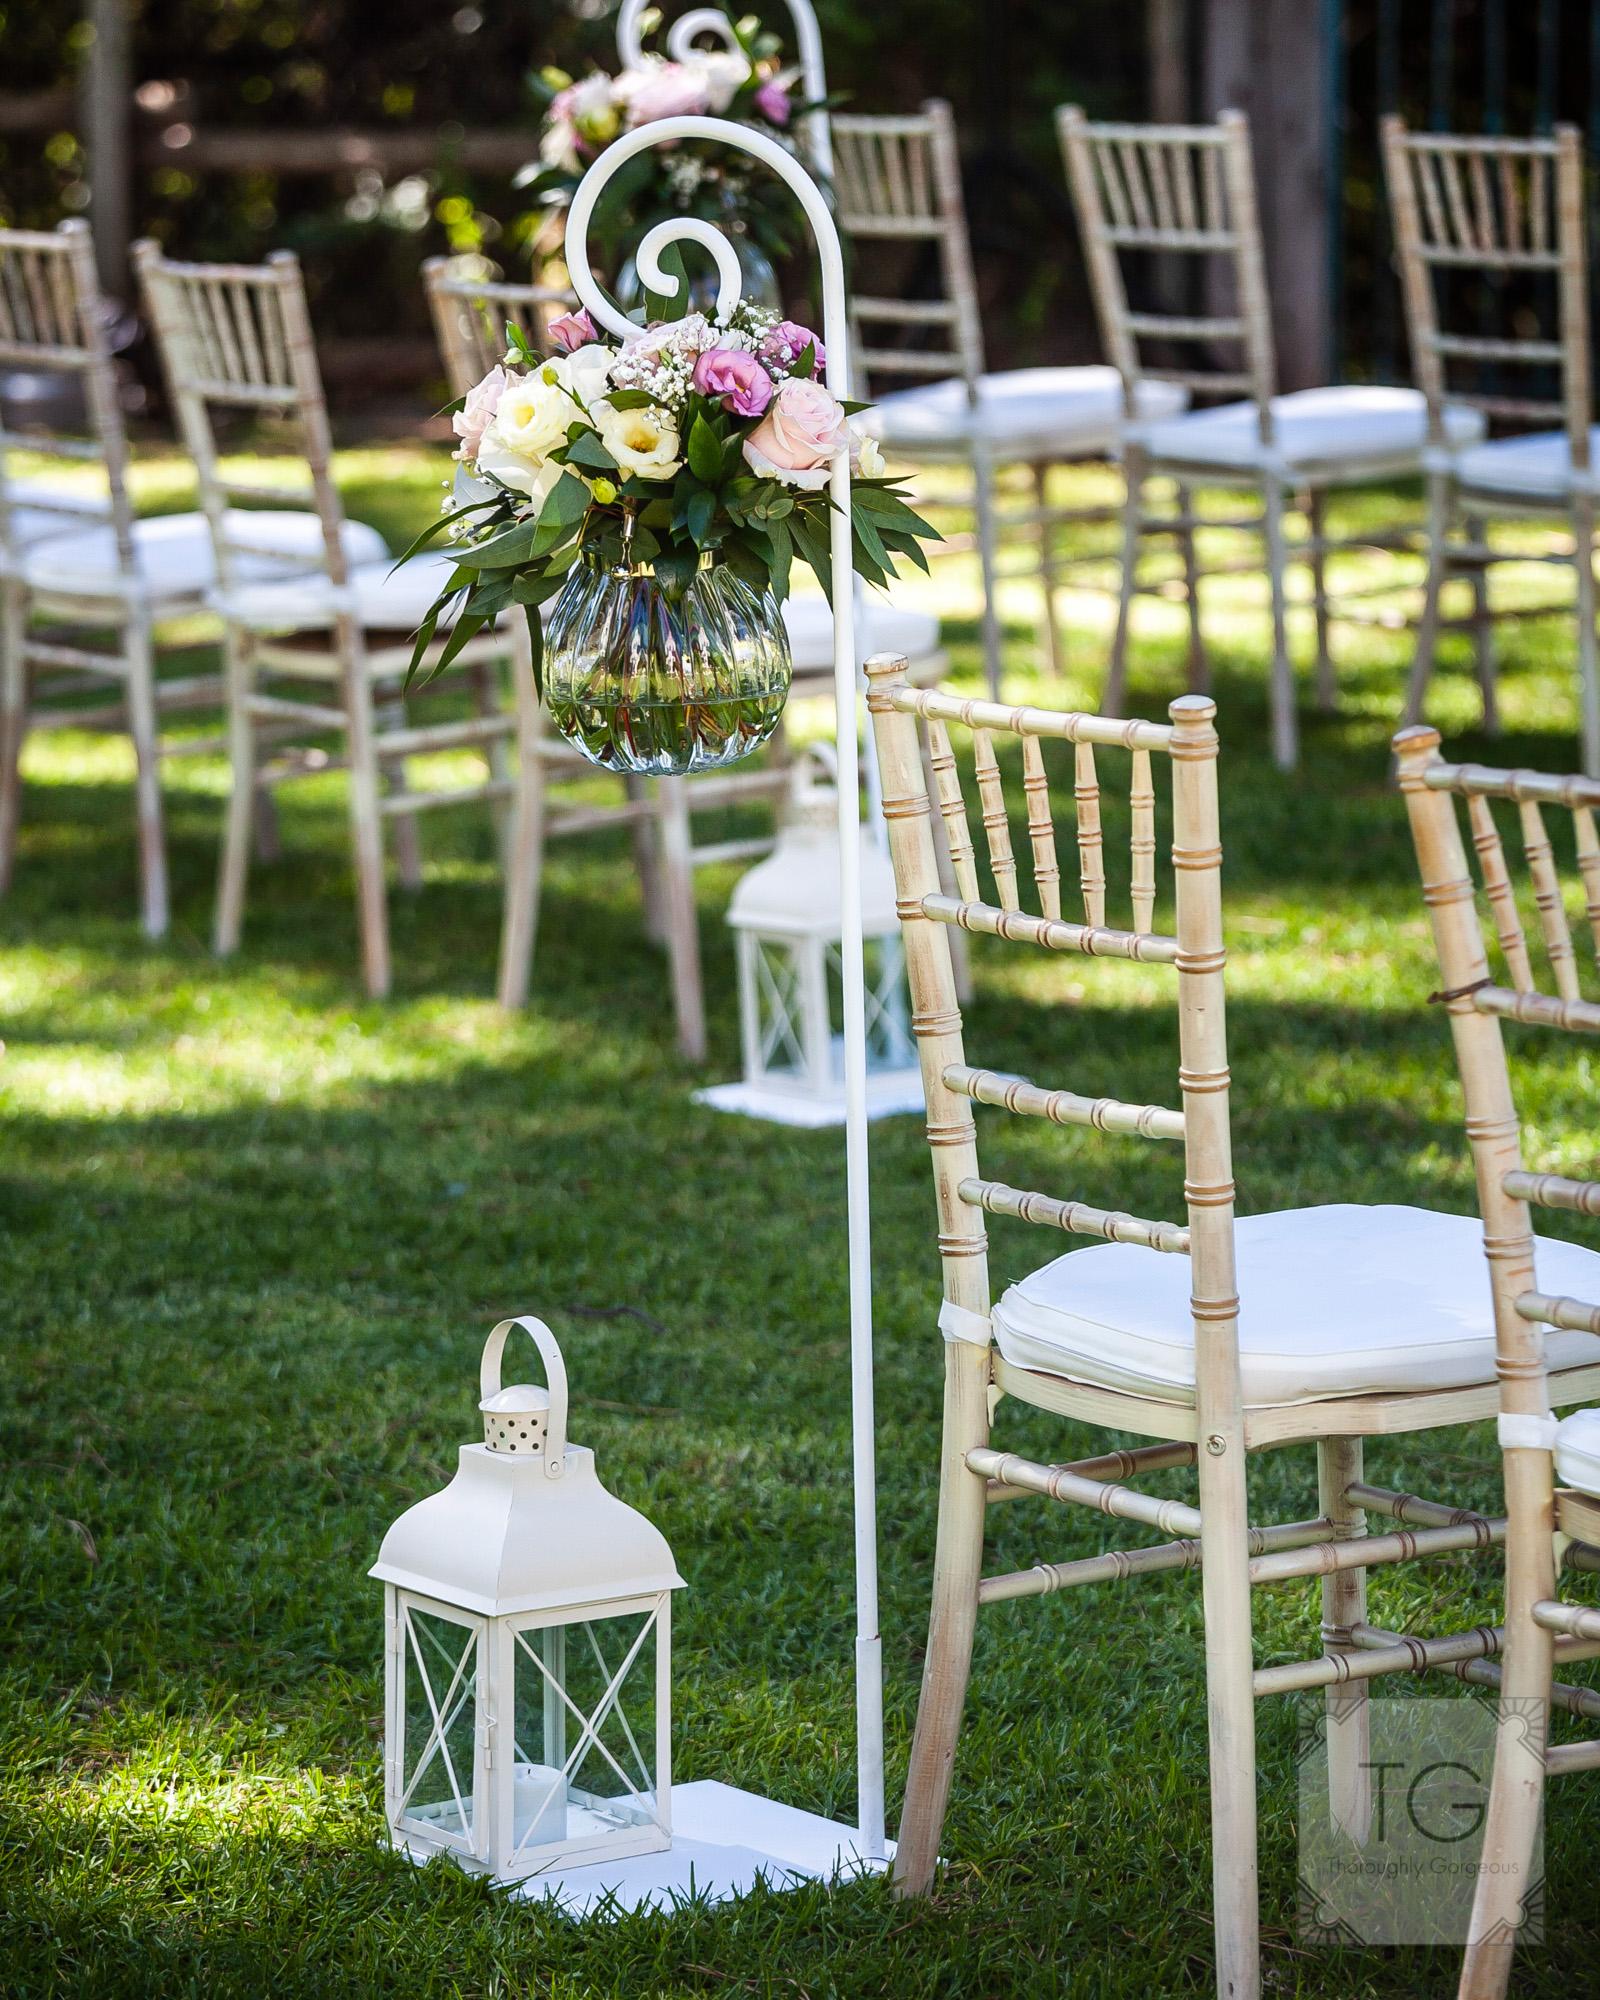 Ceremony decor, villa wedding